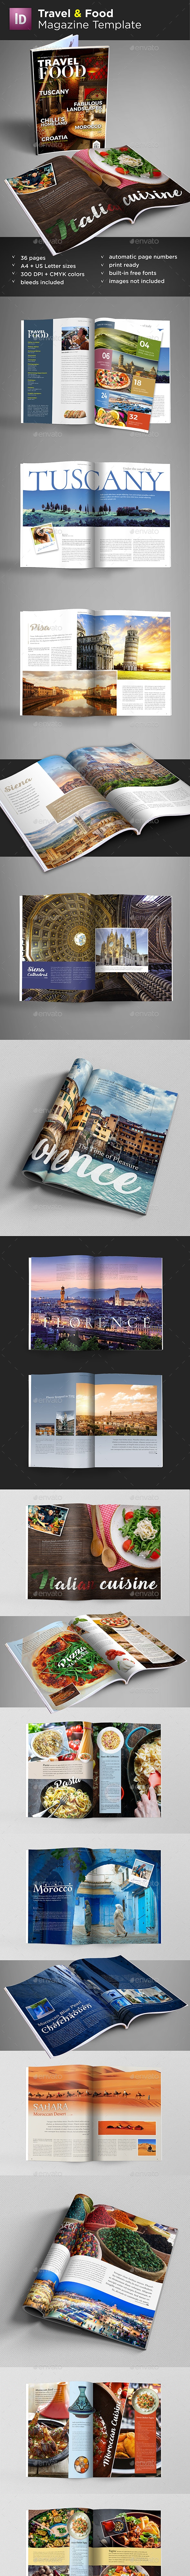 Travel & Food Magazine Template - Magazines Print Templates